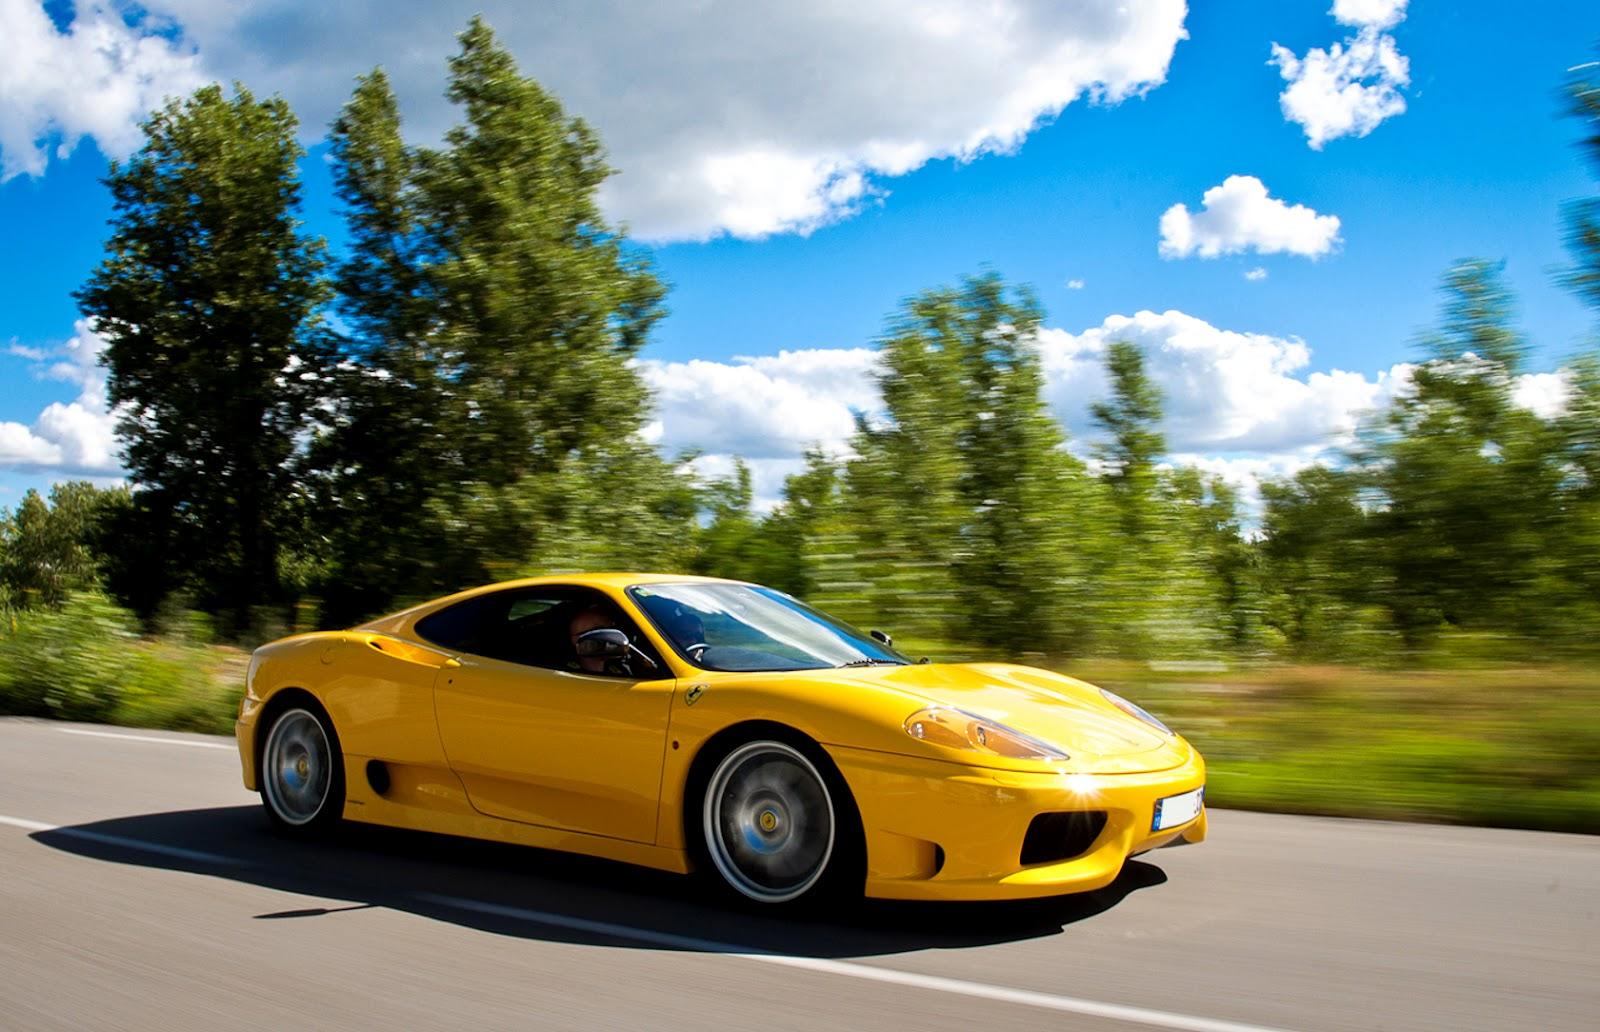 Top 50 Most Dashing And Beautiful Ferrari Car Wallpapers In Hd